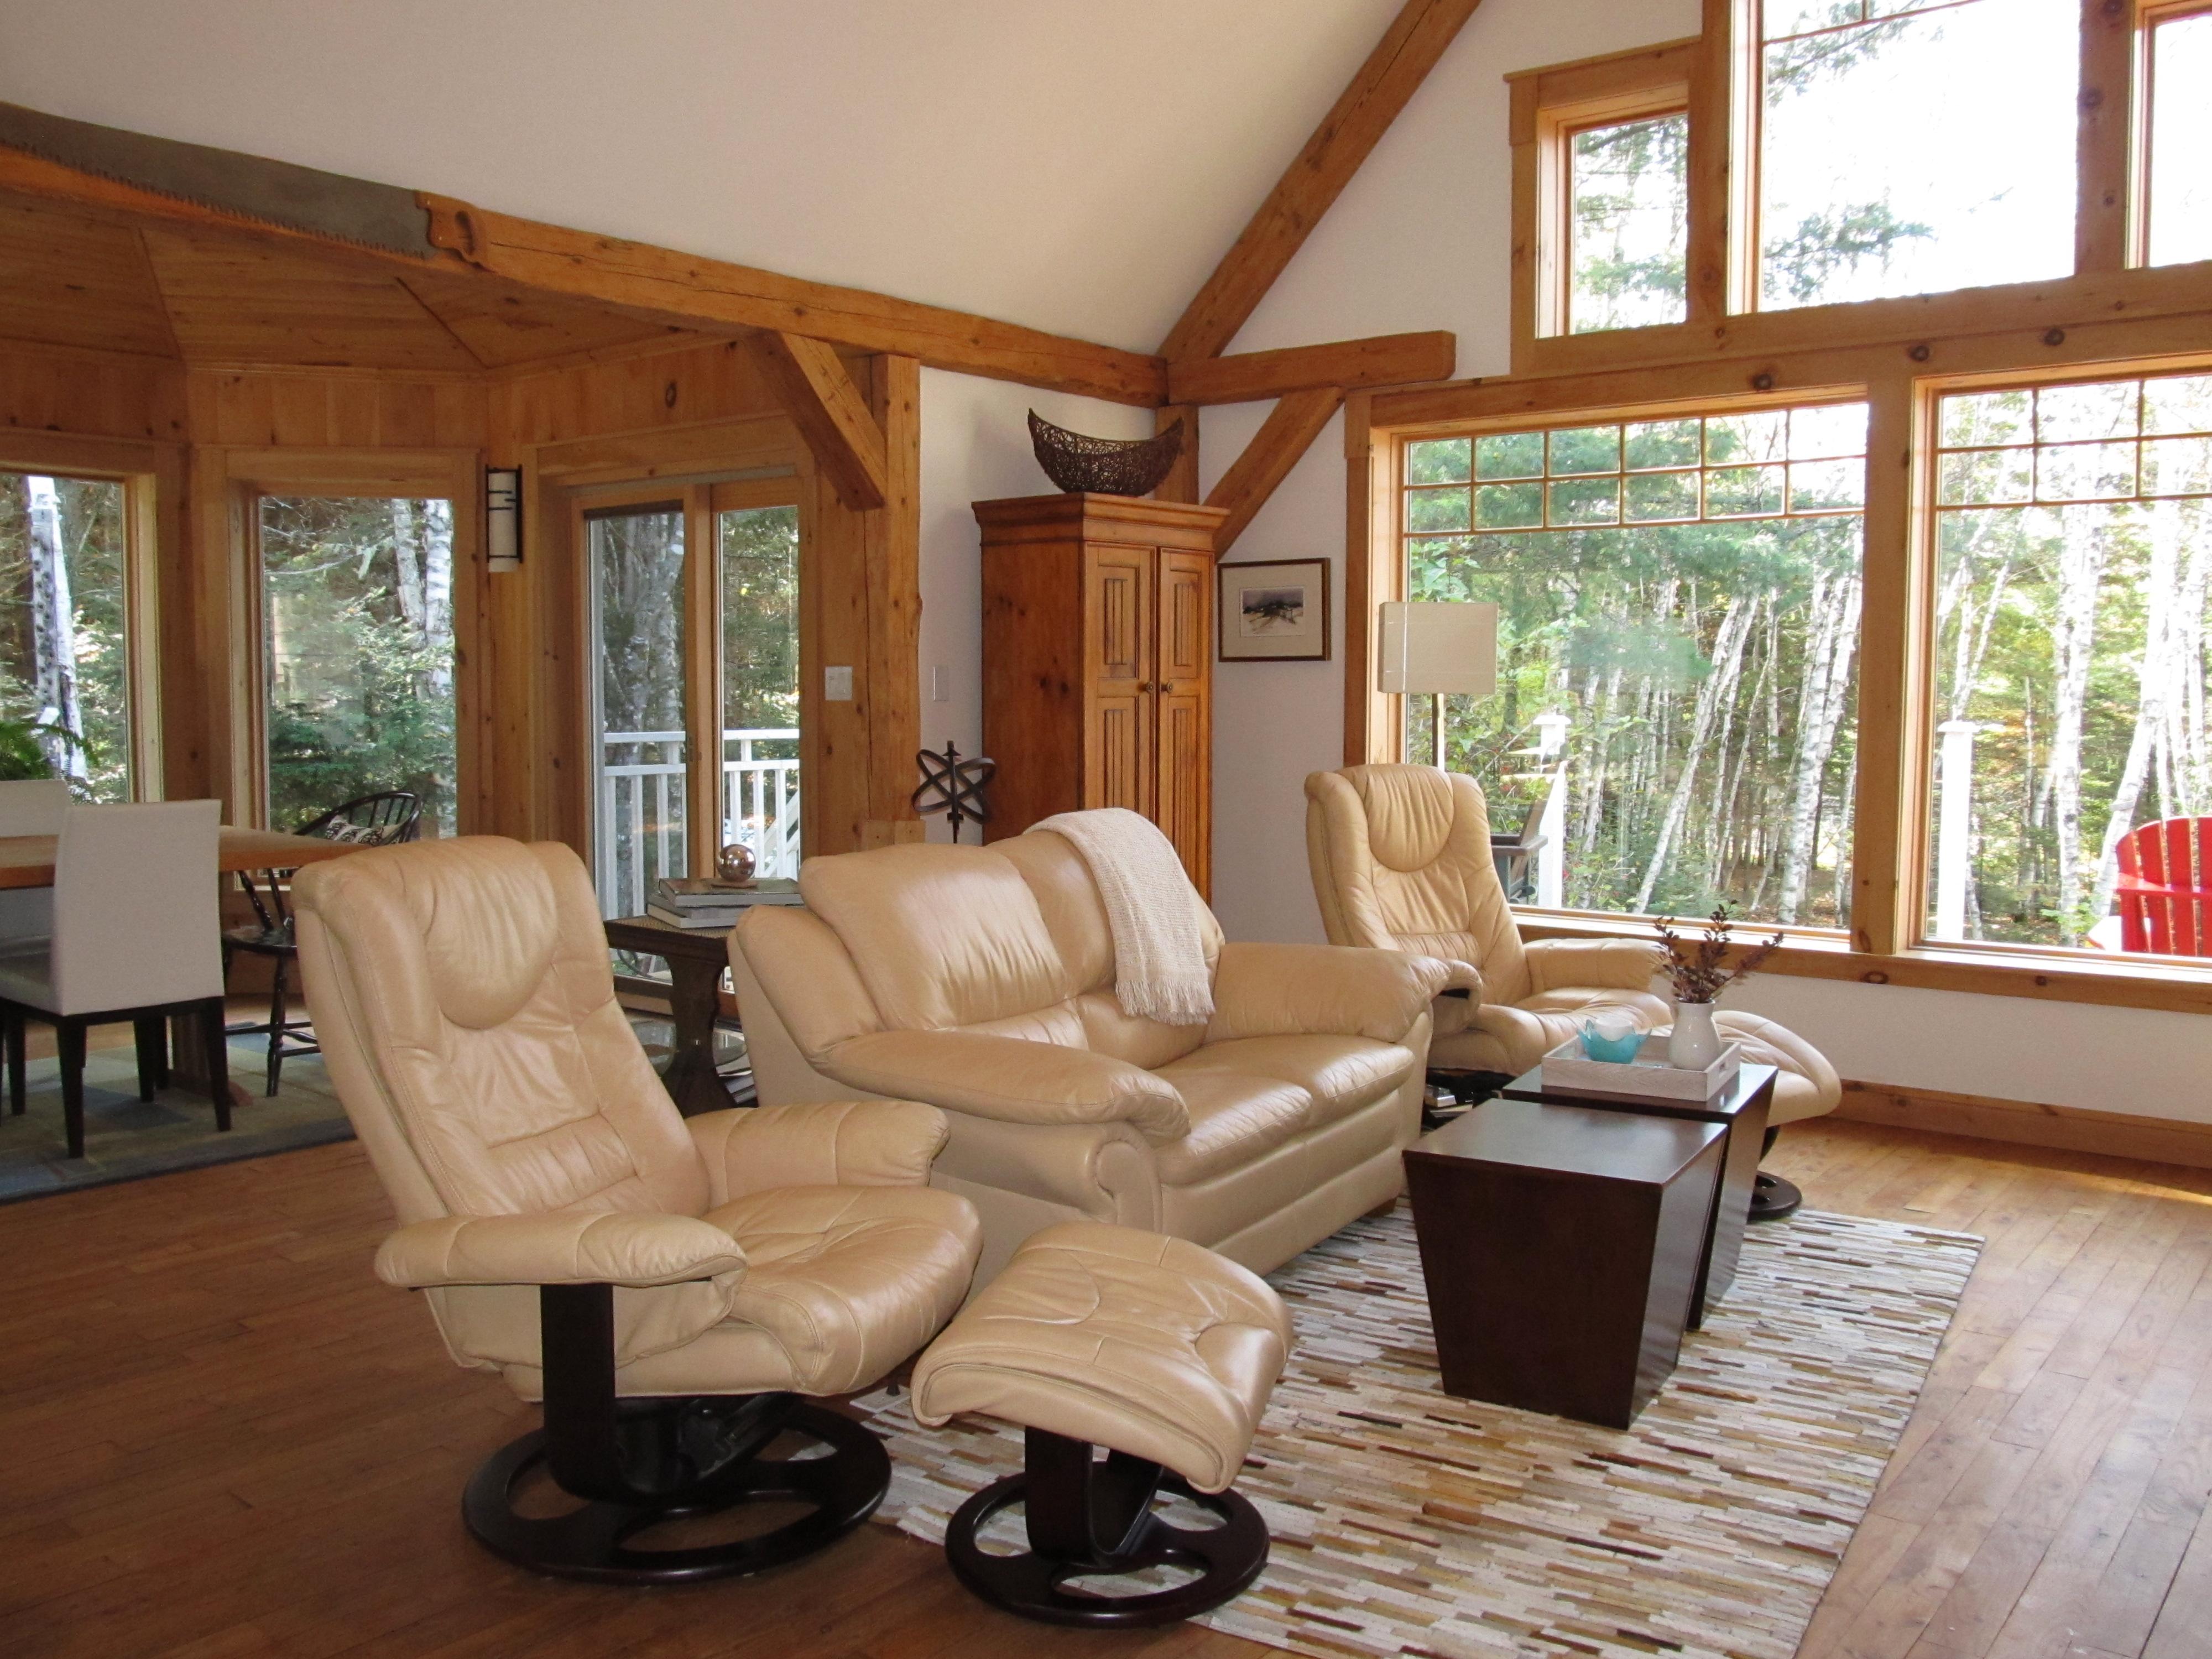 Image Result For Living Area Ceiling Design